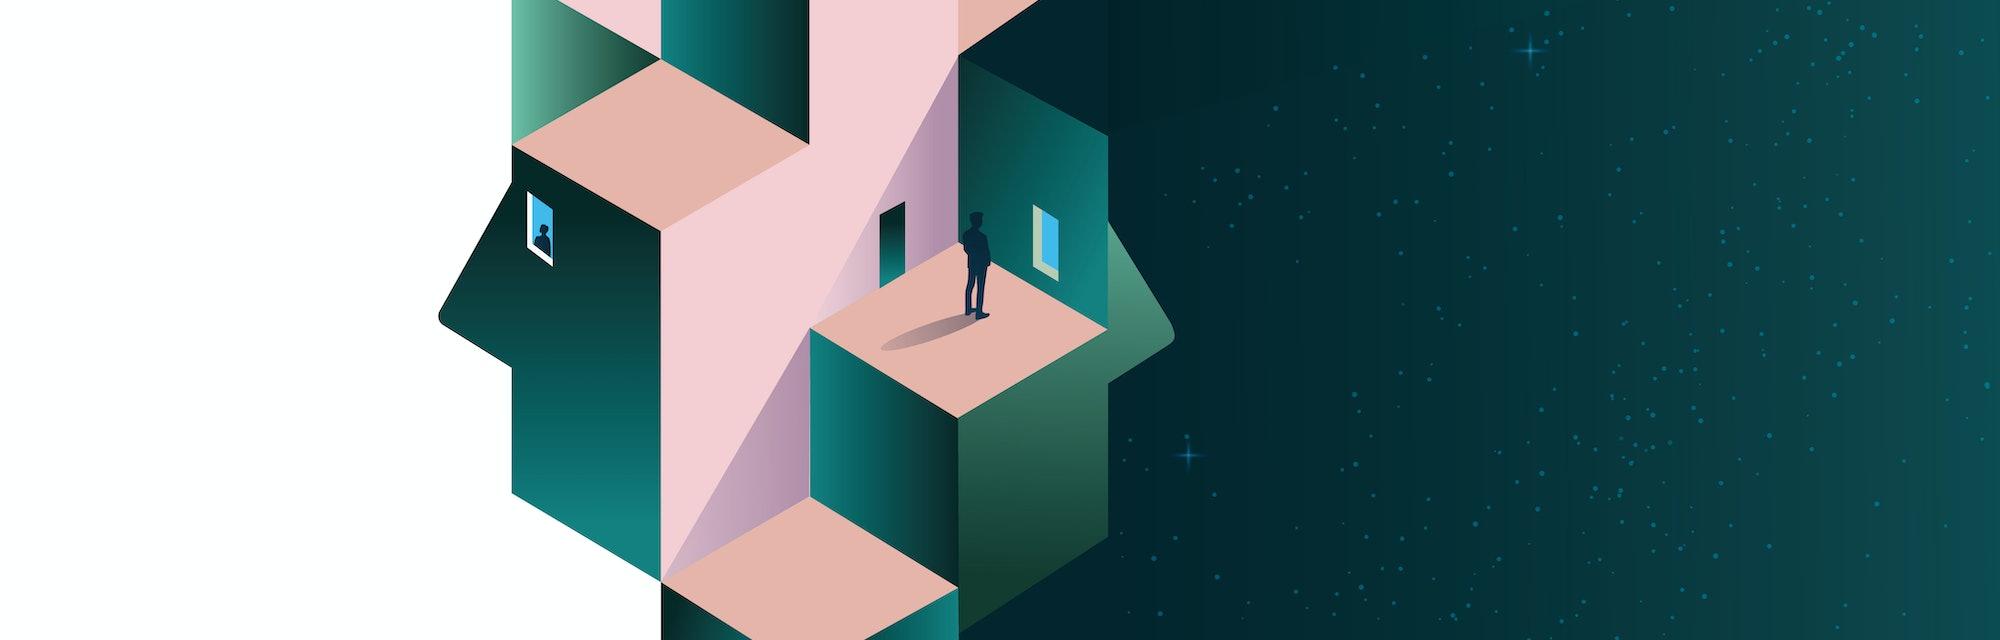 Psychology concept vector illustration. Mental health, depression, seasonal affected, sleep disorder. Psychiatry, philosophy.